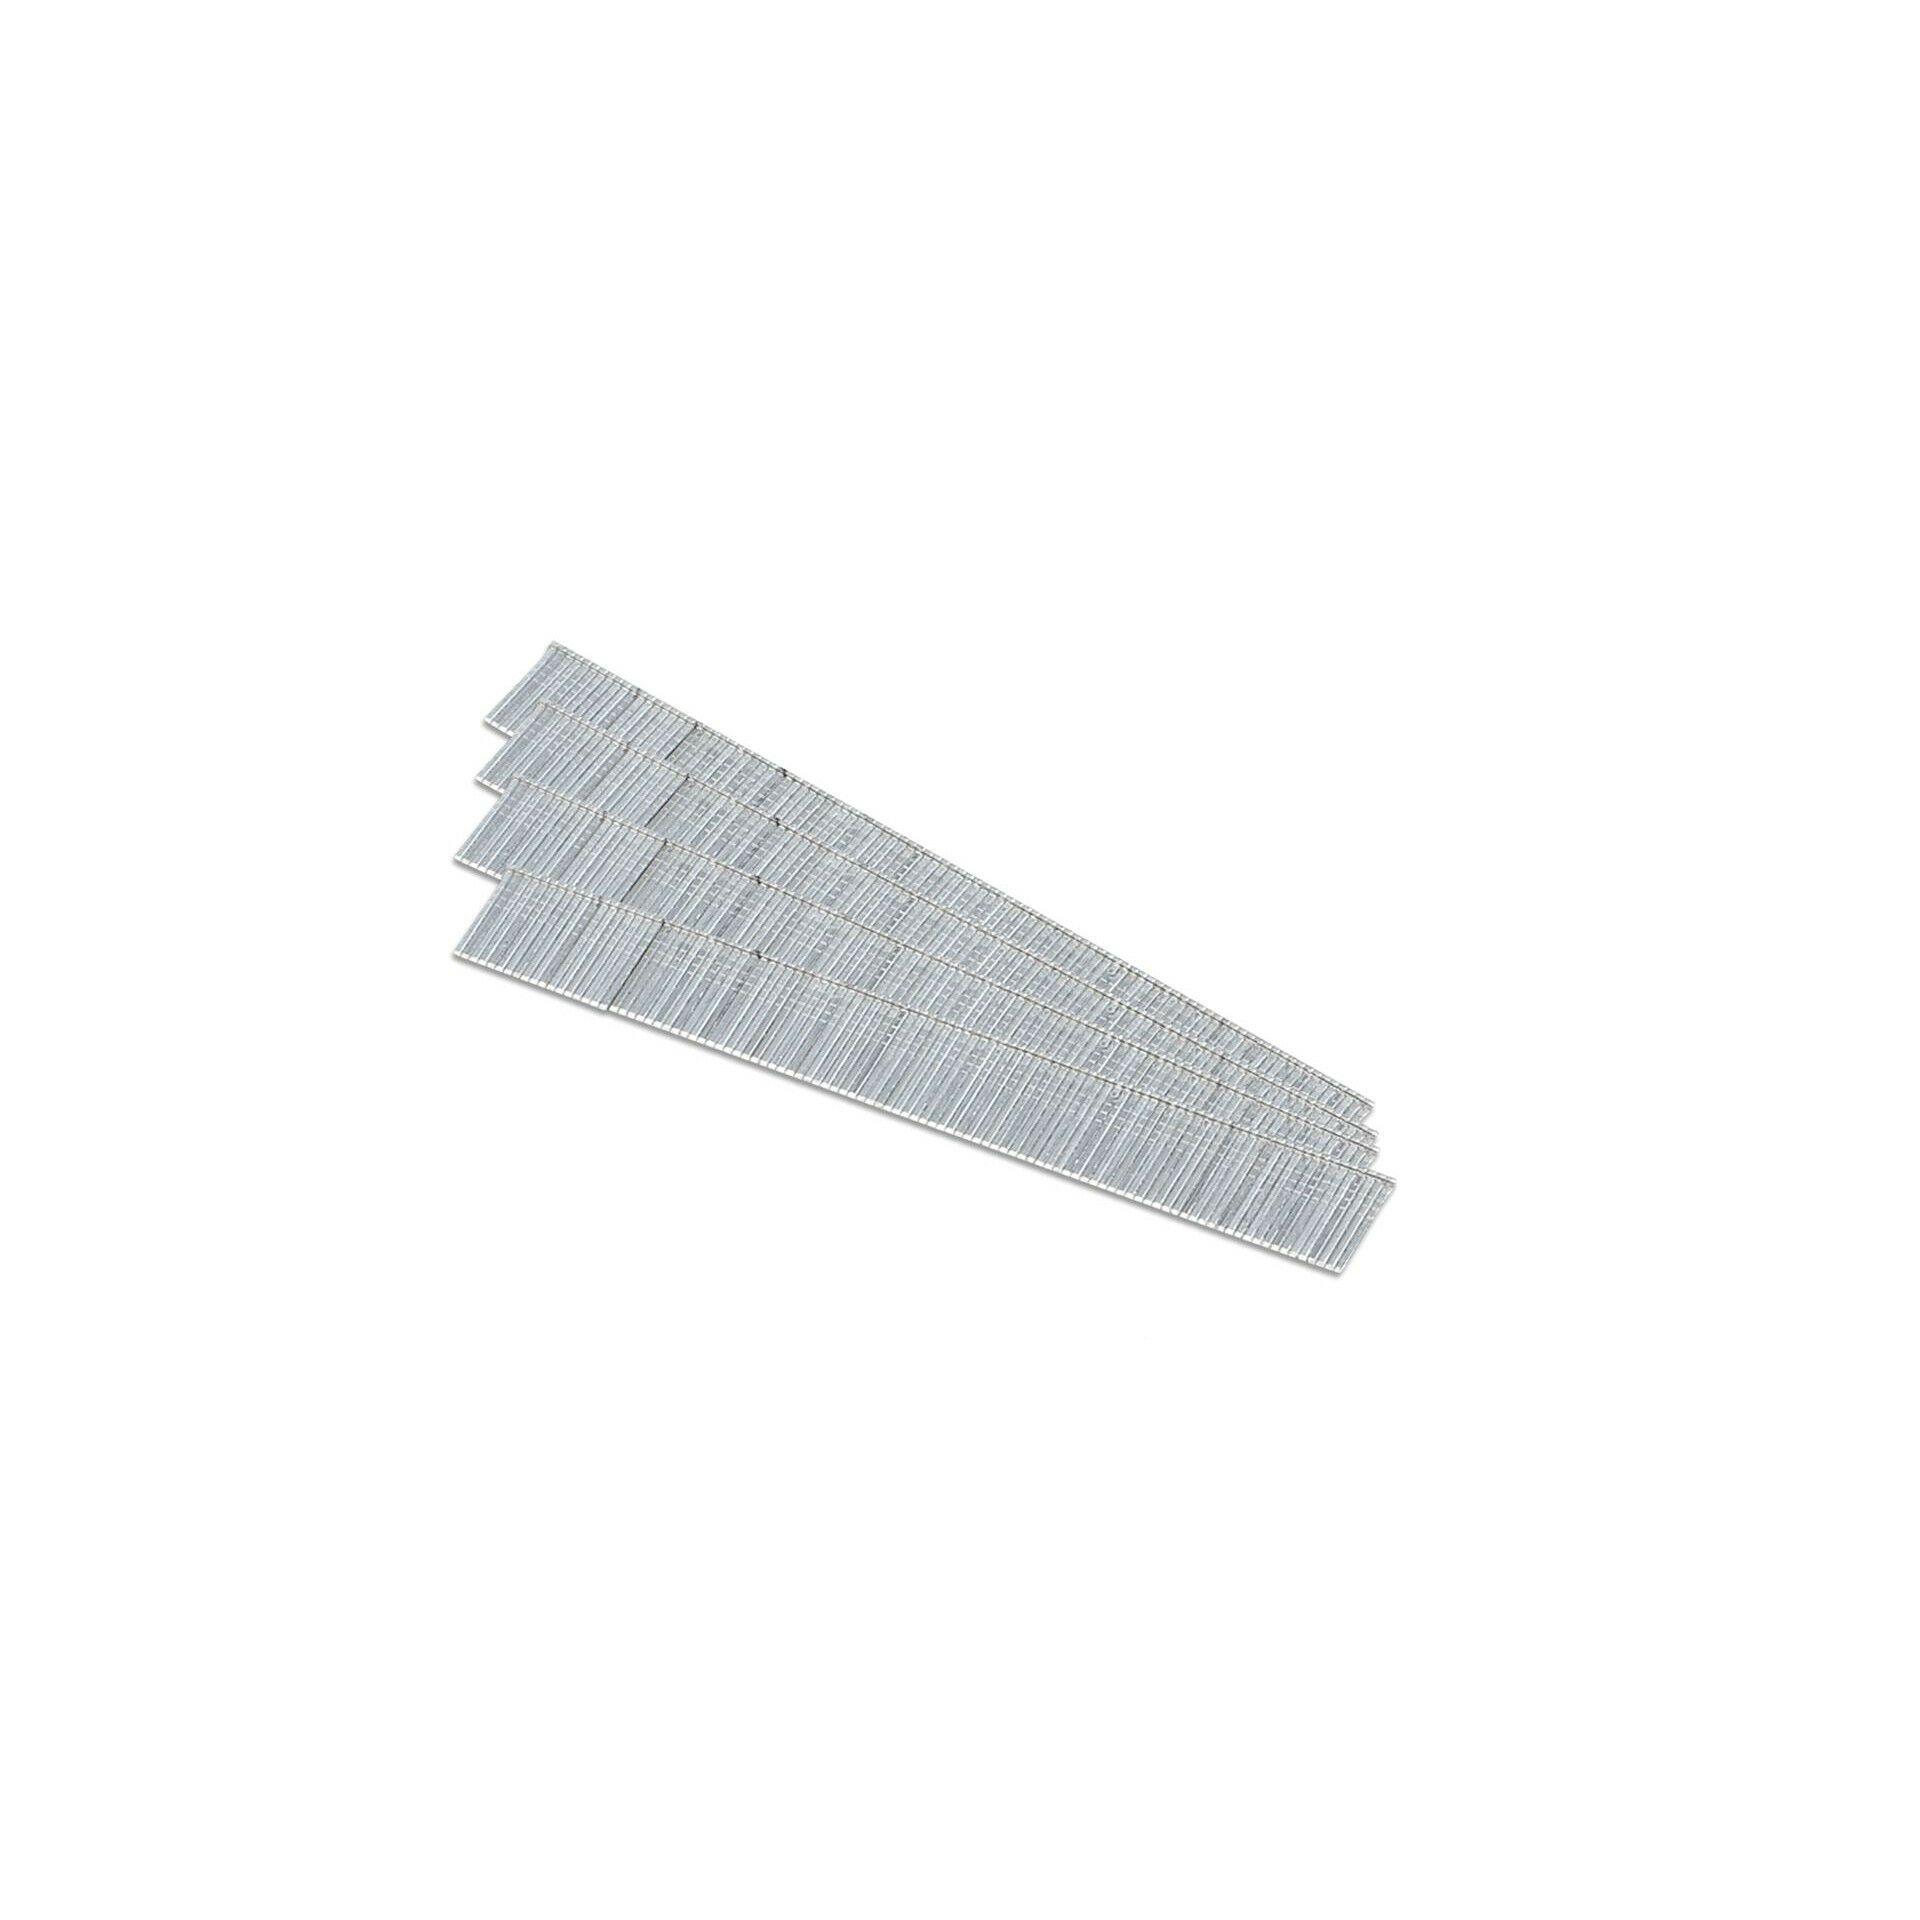 1000 Spijkers 50 mm | Stalen nagels voor nagelapparaat Powerplus POWAIR0311